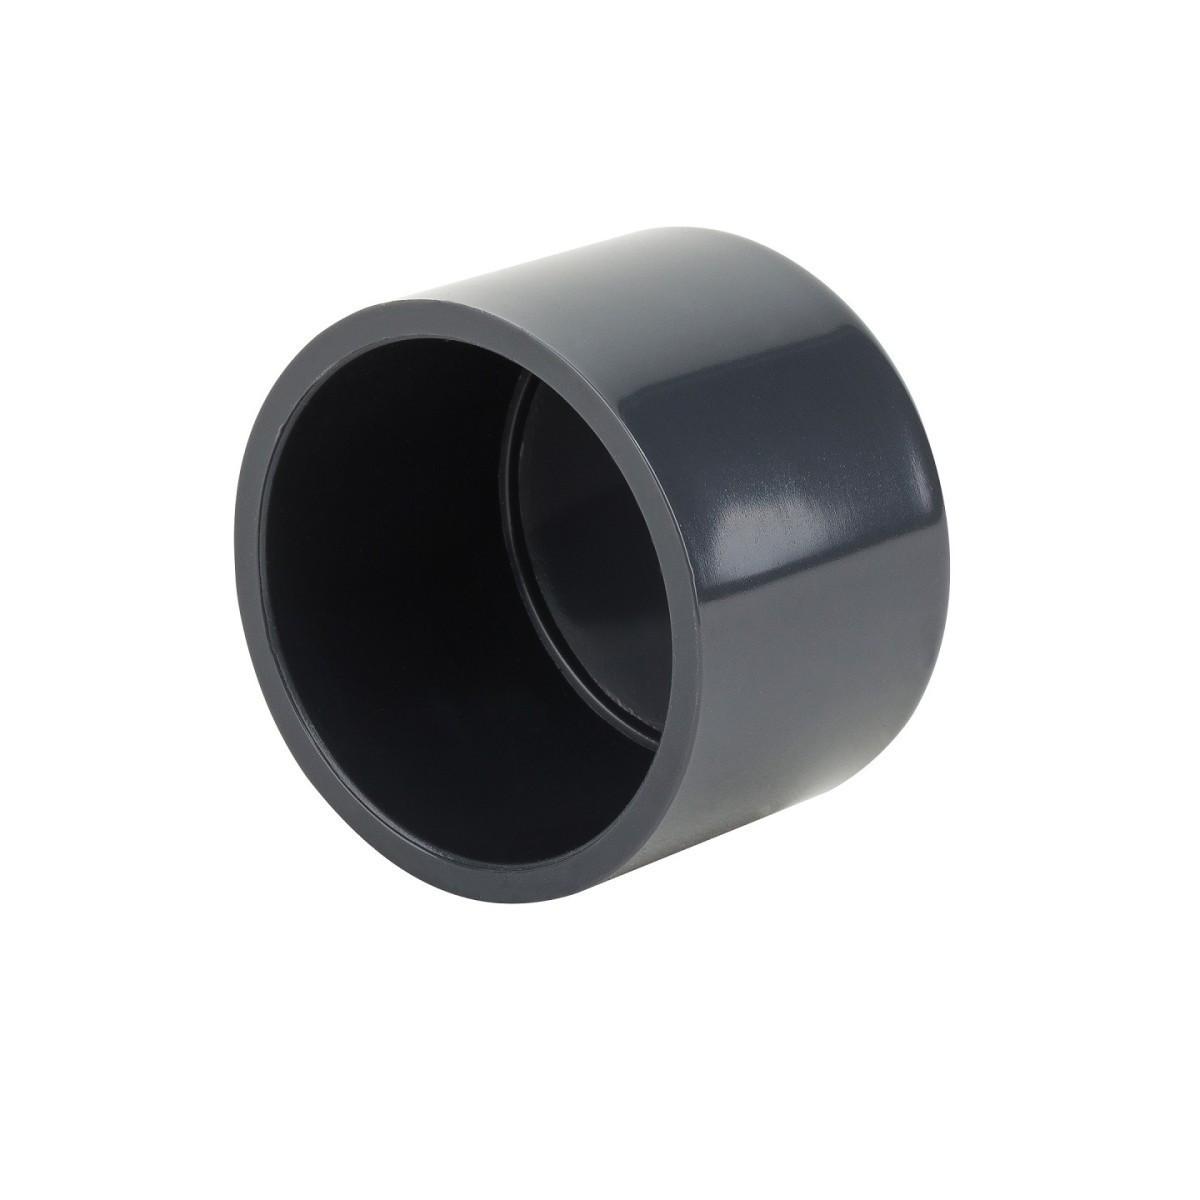 Заглушка ПВХ Aquaviva клеевая, диаметр 63 мм.